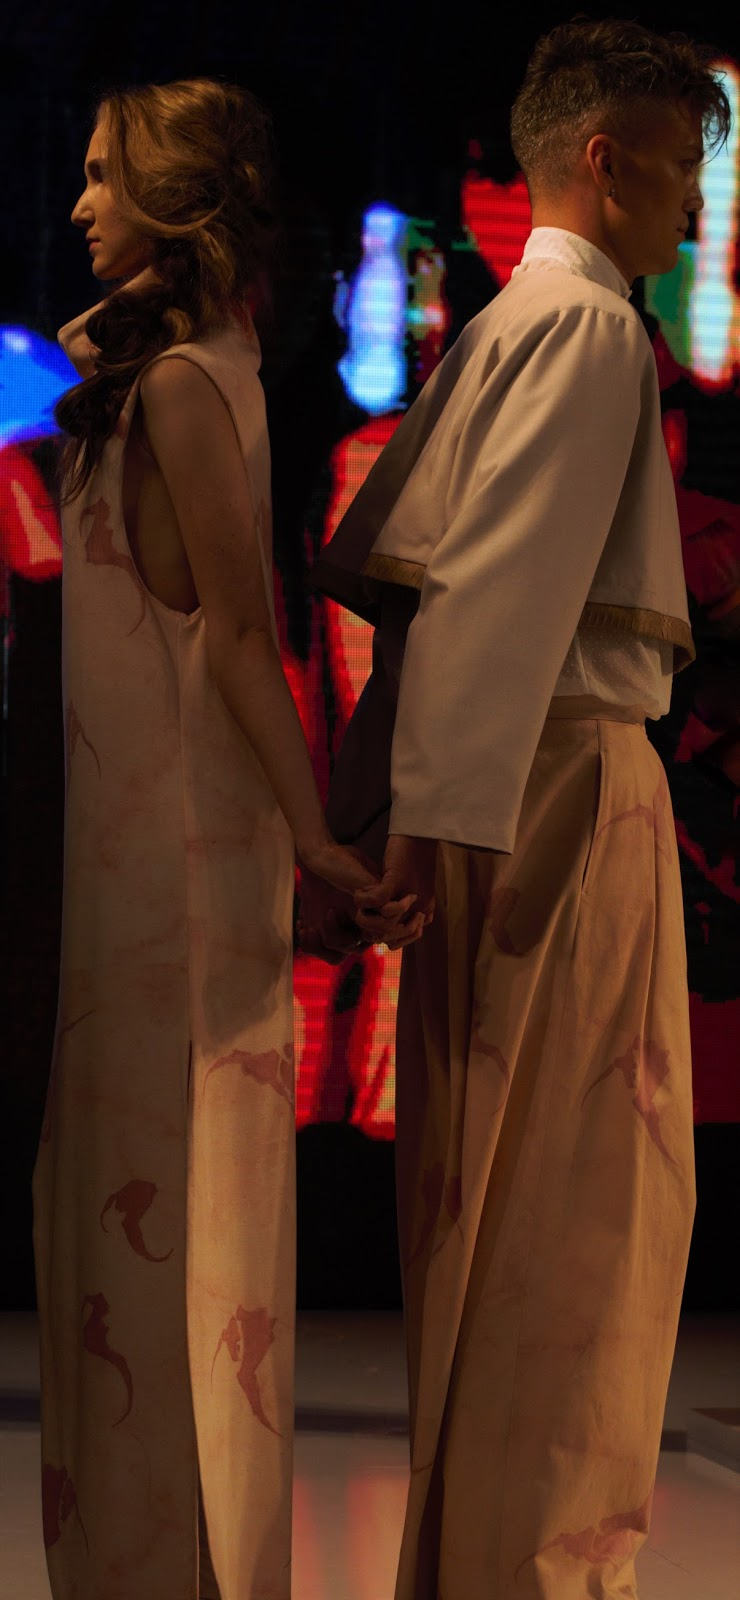 White Couple in Tokyo RW.jpg